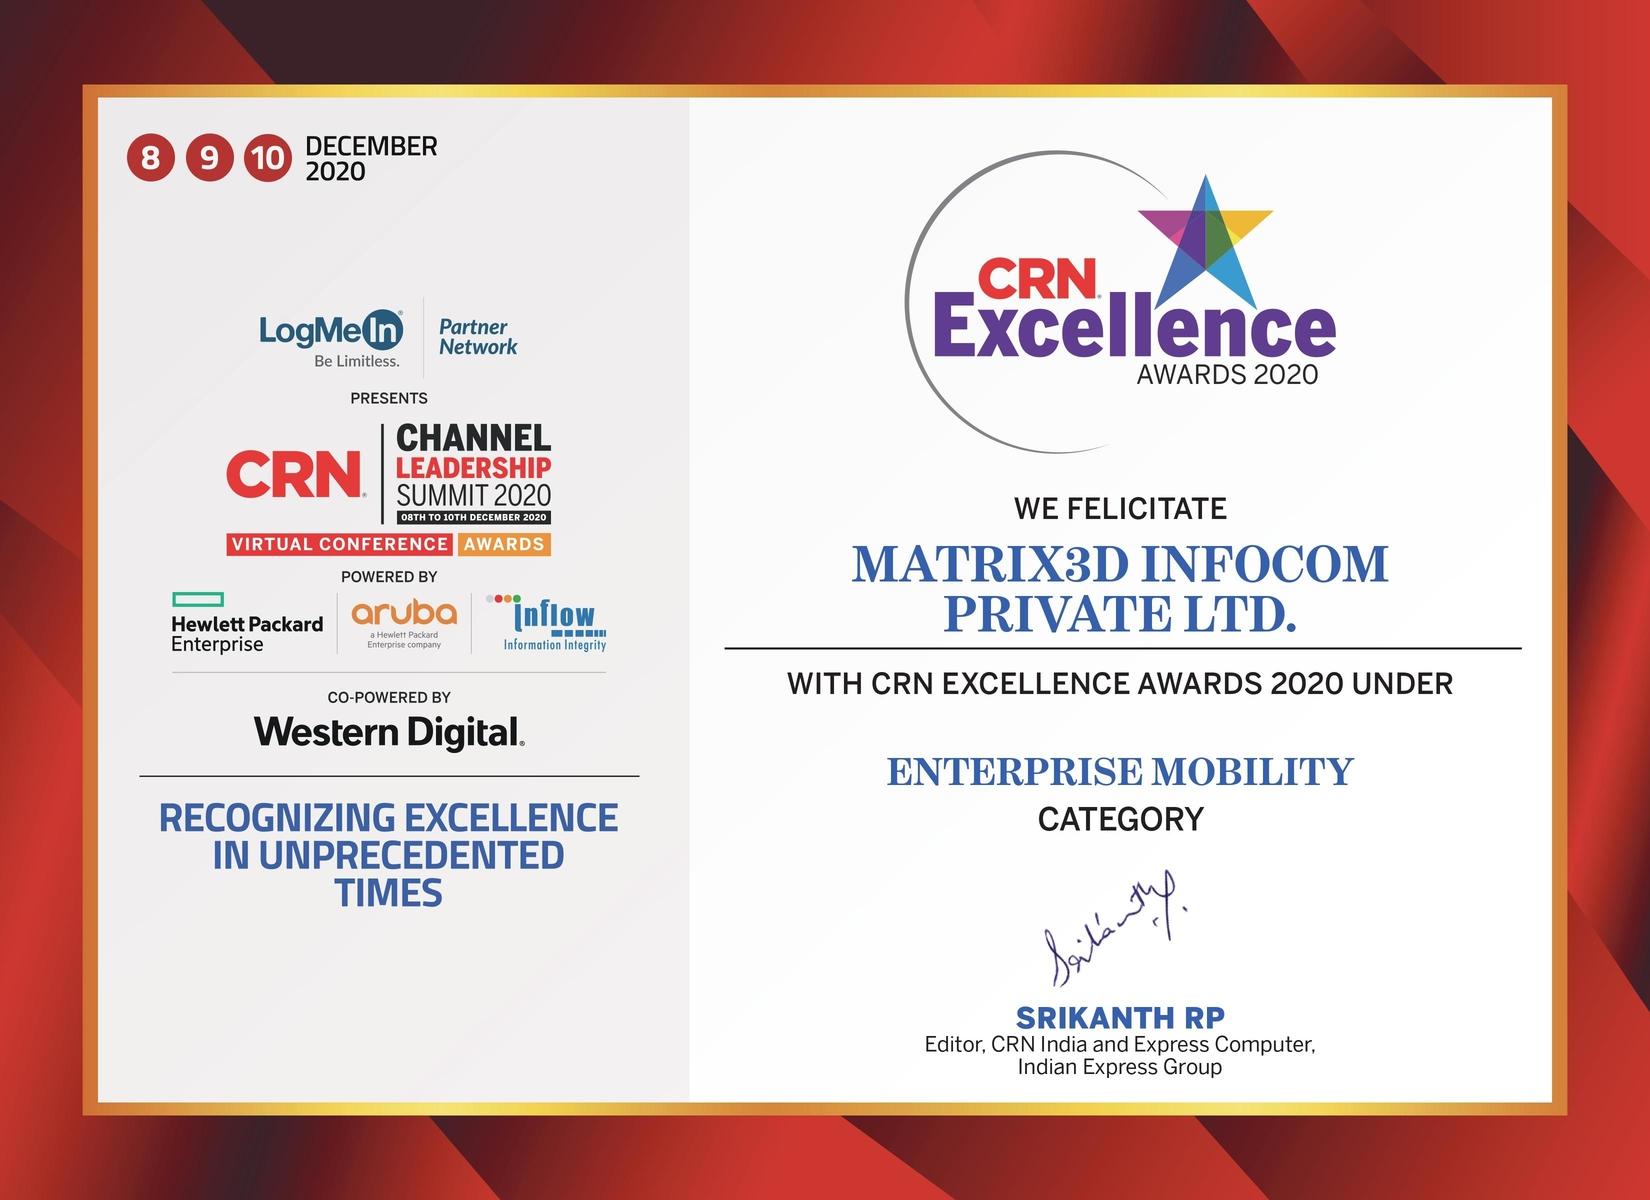 CRN Award Enterprise Mobility 2020